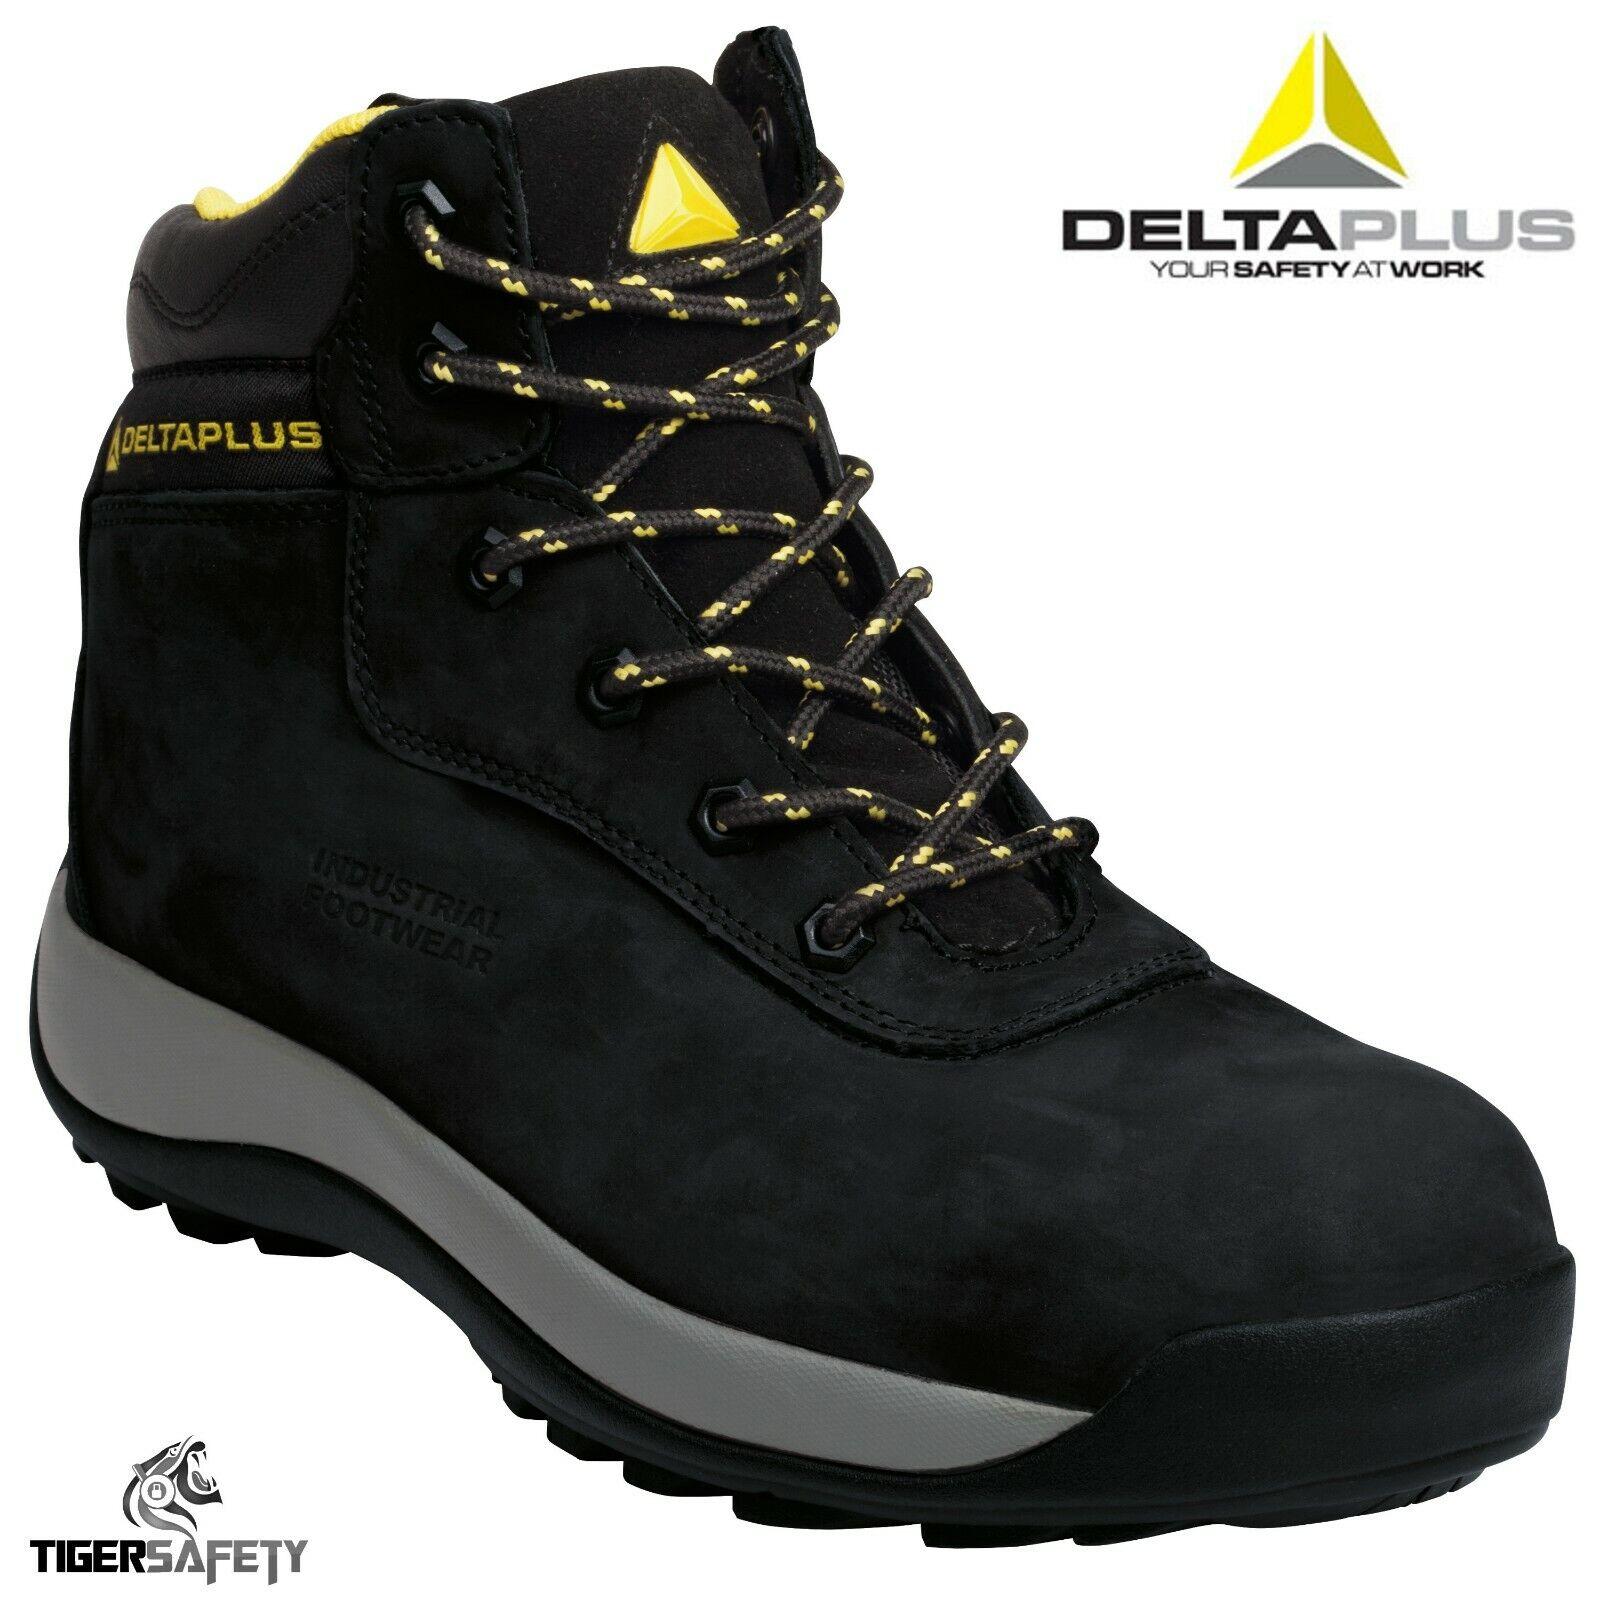 Delta Plus Saga S3 HRO Black Nubuck Composite Toe Cap Work Safety Boots PPE